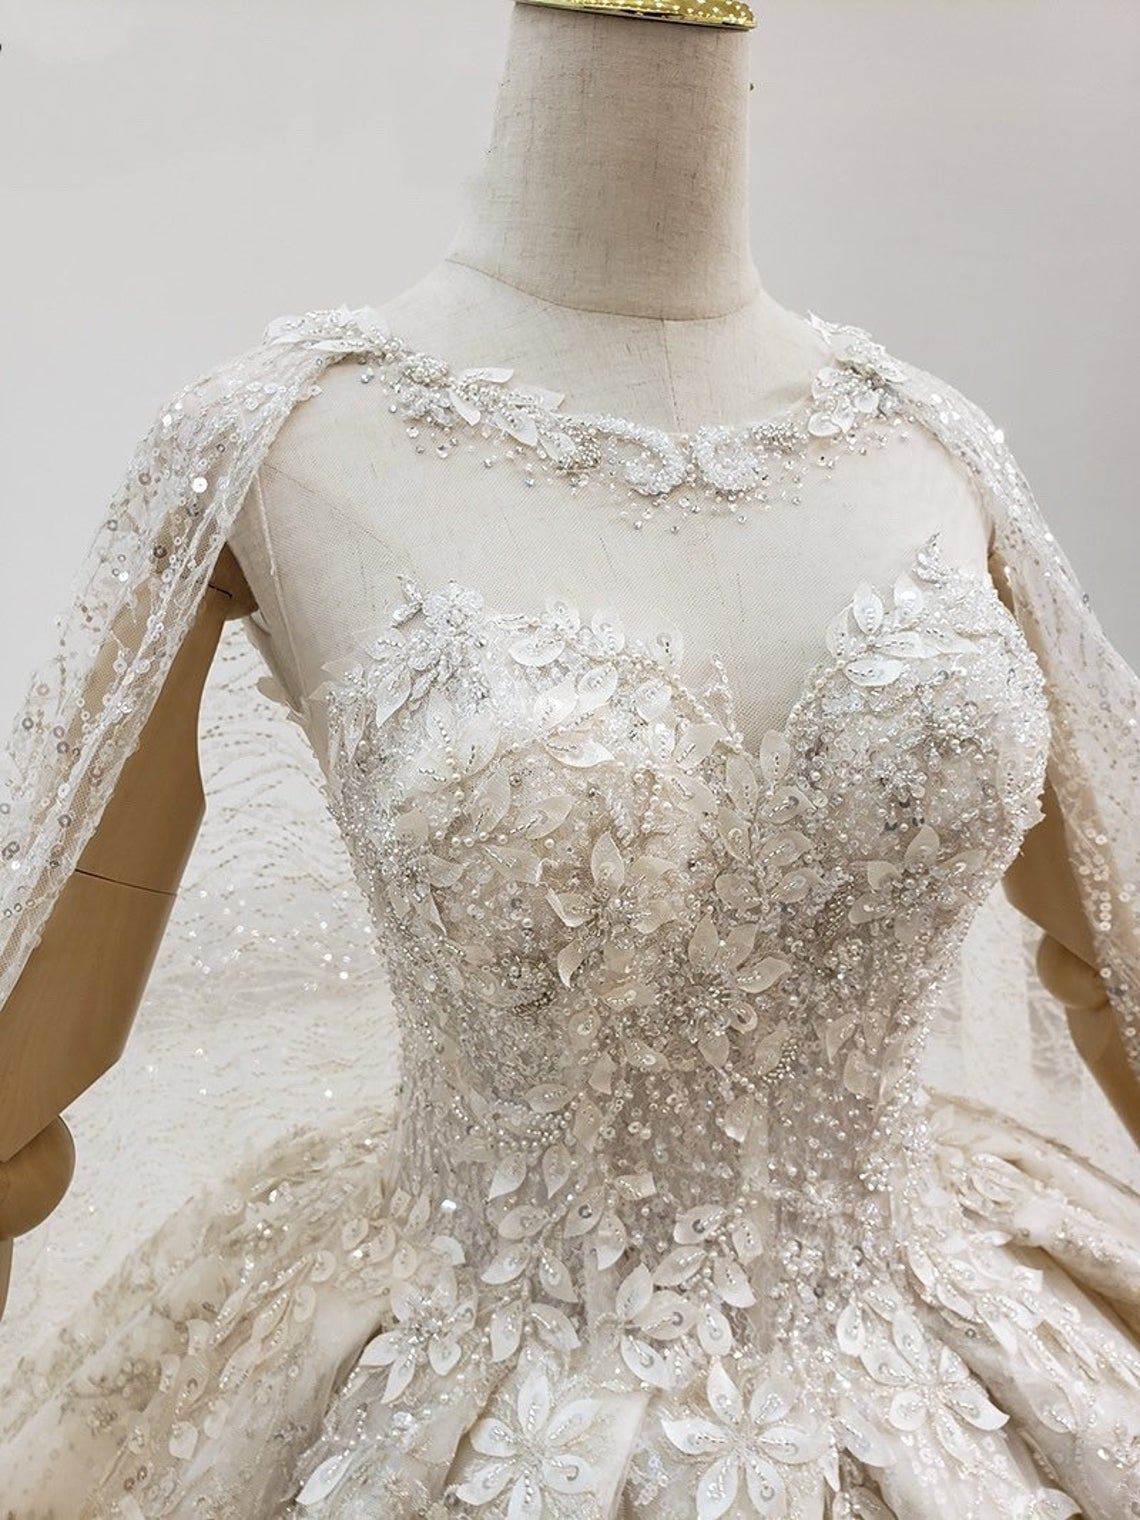 Wedding dress bling Luxury Crystal Beaded Embroidery Bling Wedding Dress